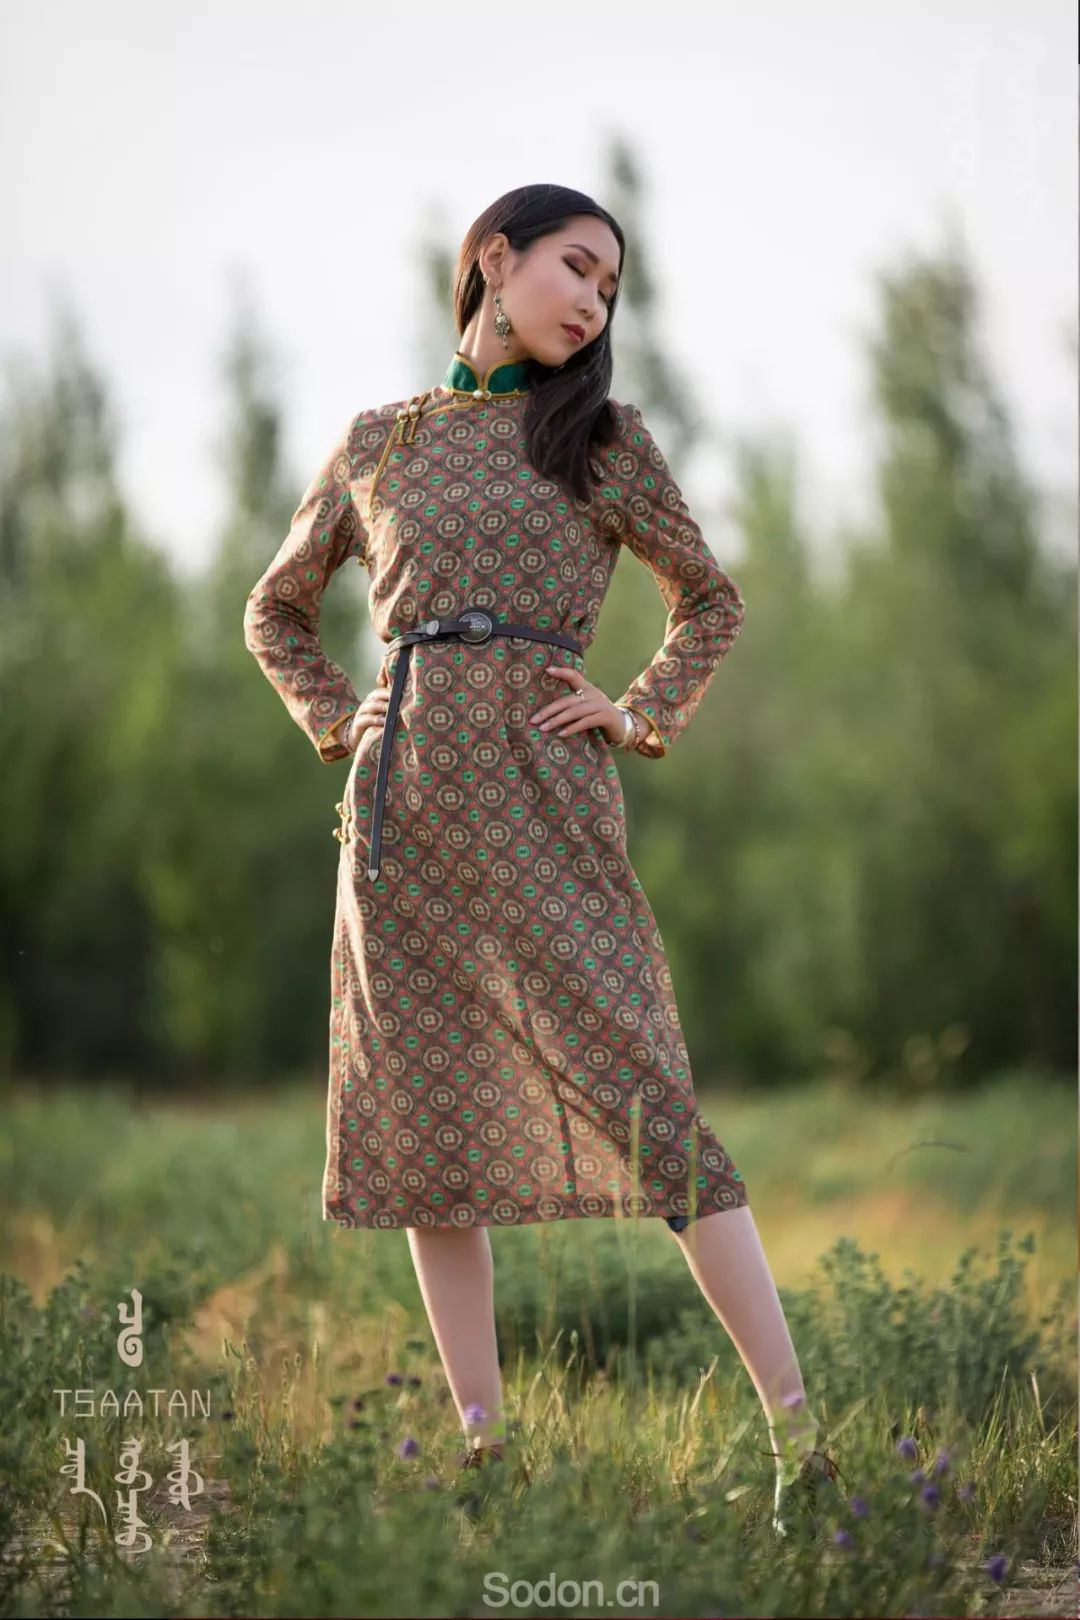 TSAATAN蒙古时装 2019夏季新款首发 第23张